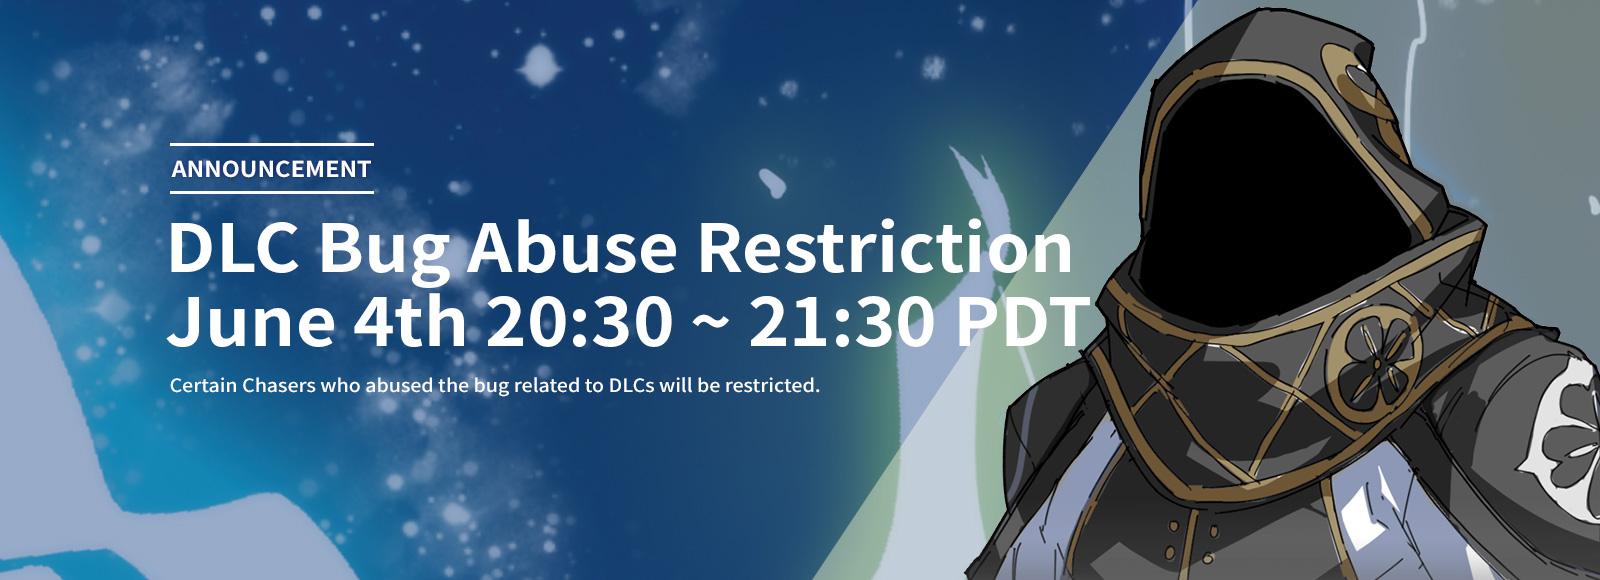 DLC Bug Abuse Restriction